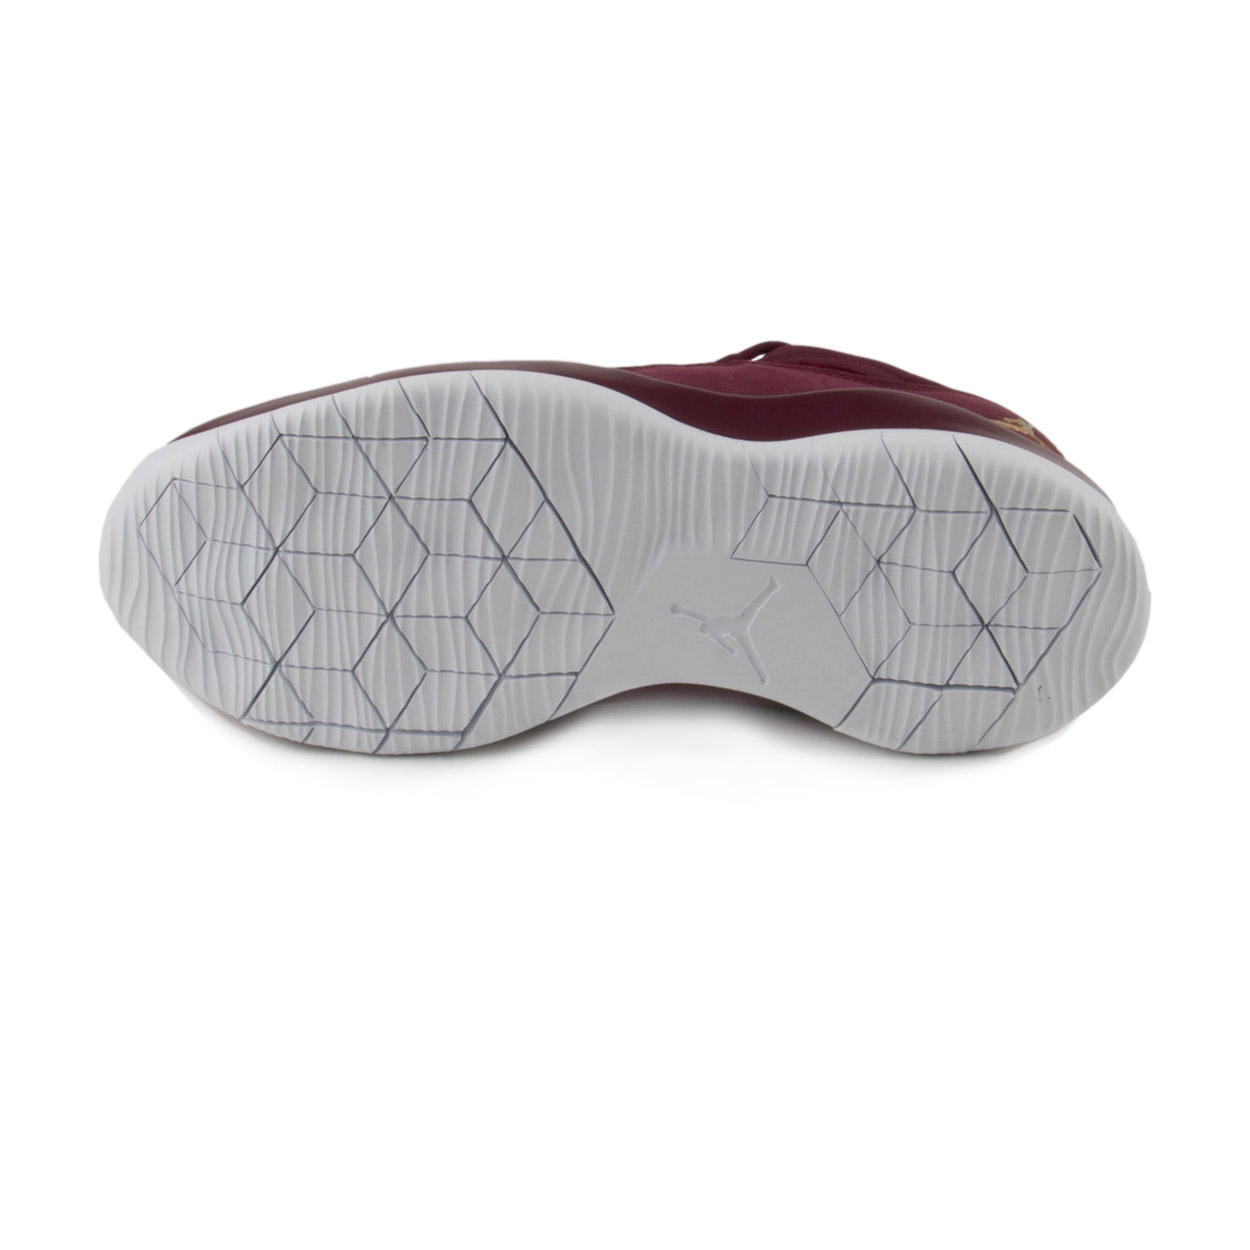 "Nike GG Girls Jordan Deca Fly Prem HC GG Nike ""Heiress"" Night Maroon 845097-609 bbb796"